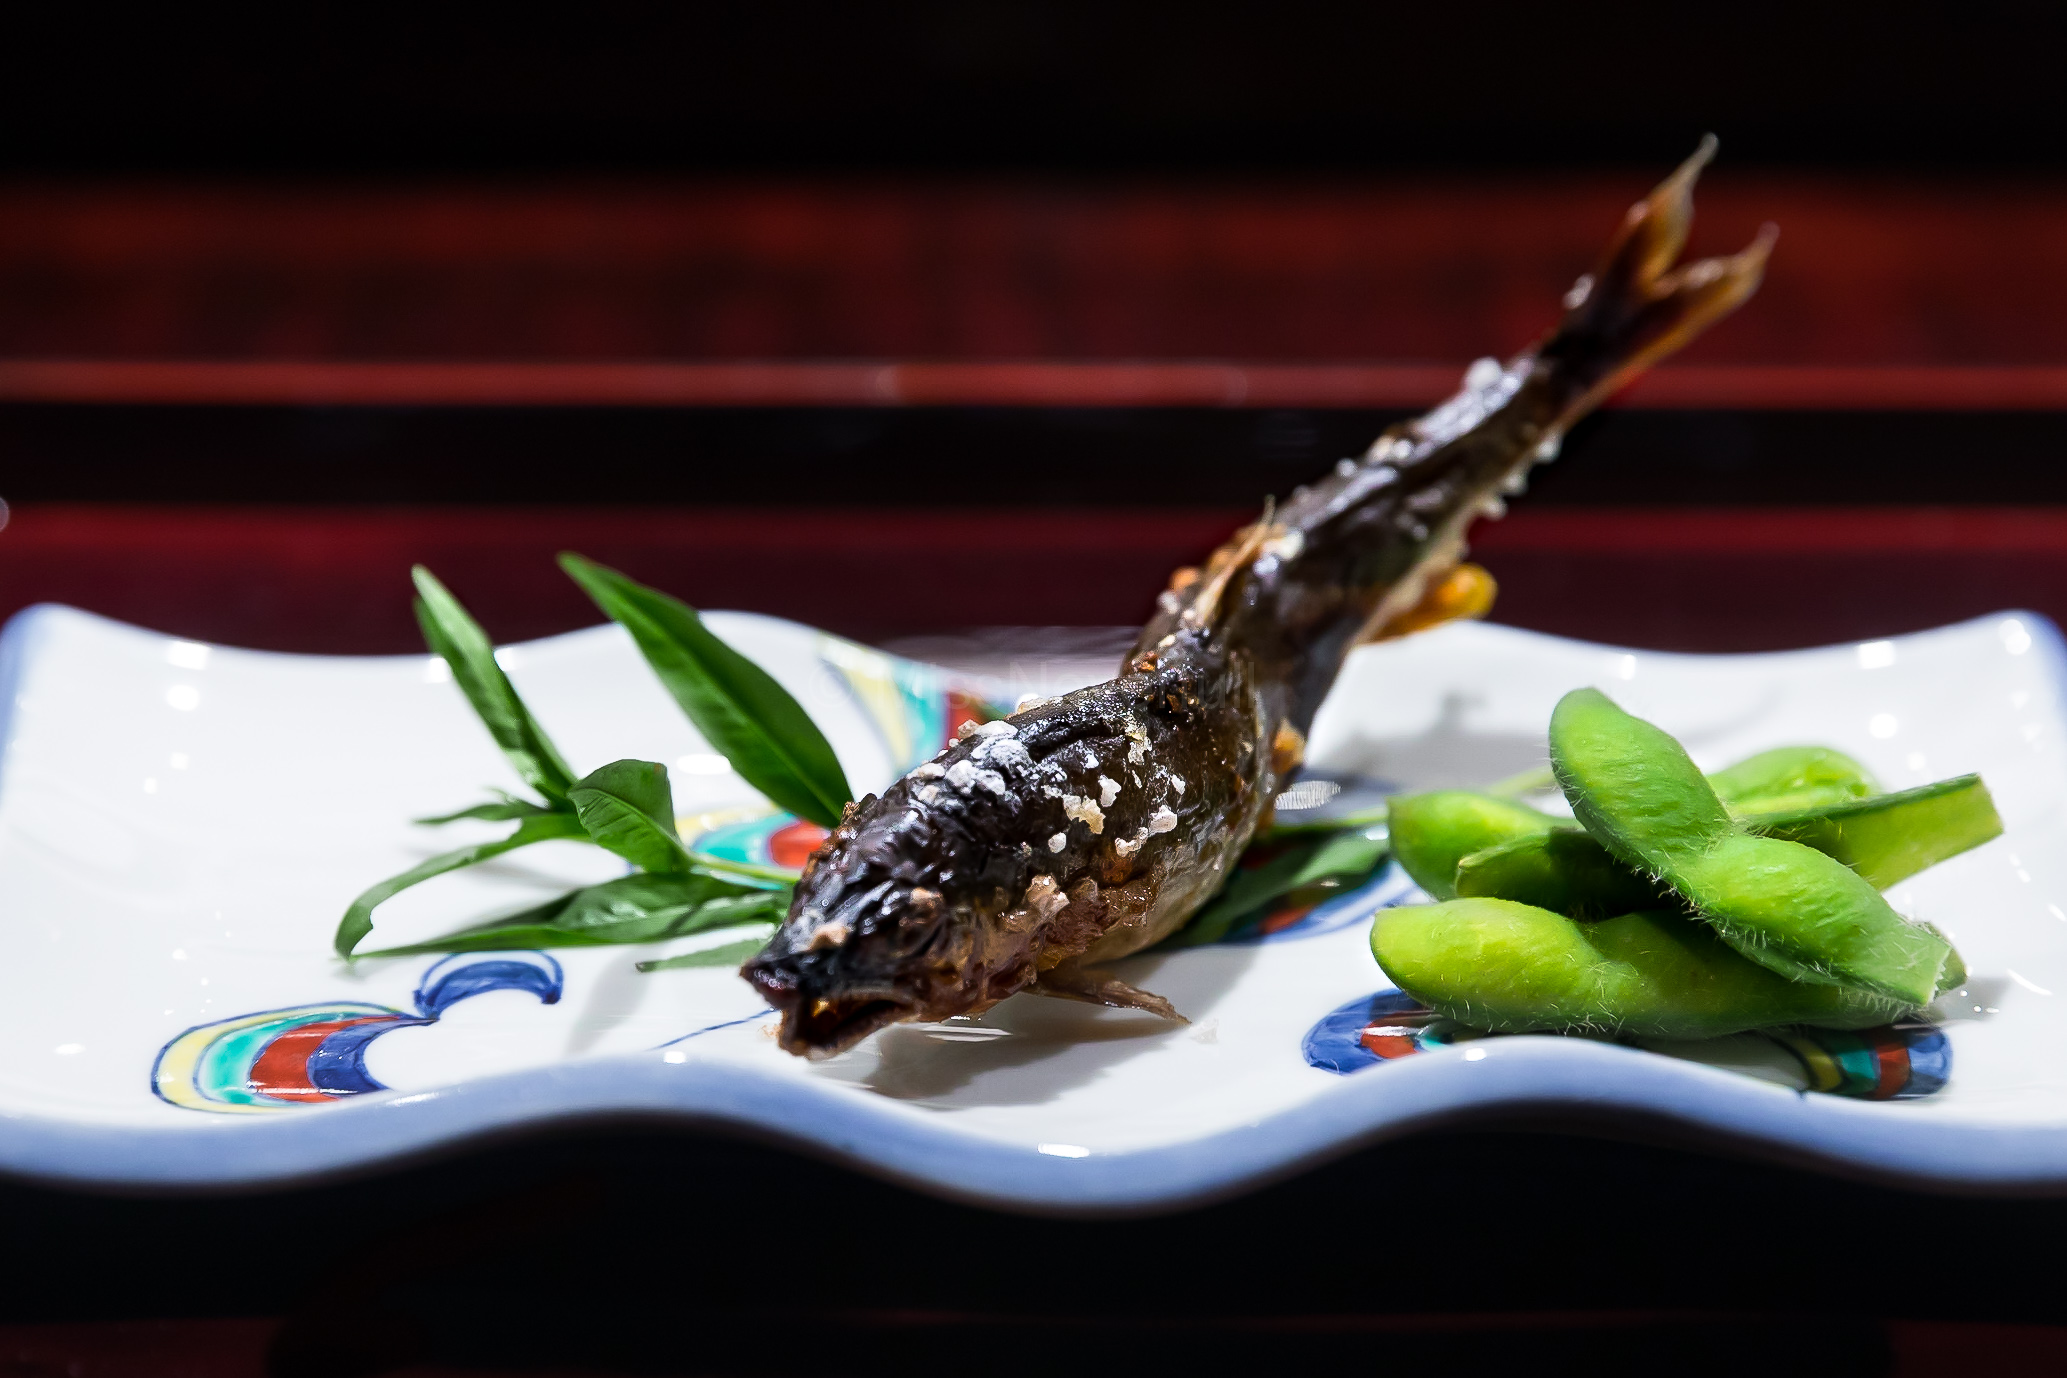 6. Grilled Ayu from Adogawa | 安曇川の鮎